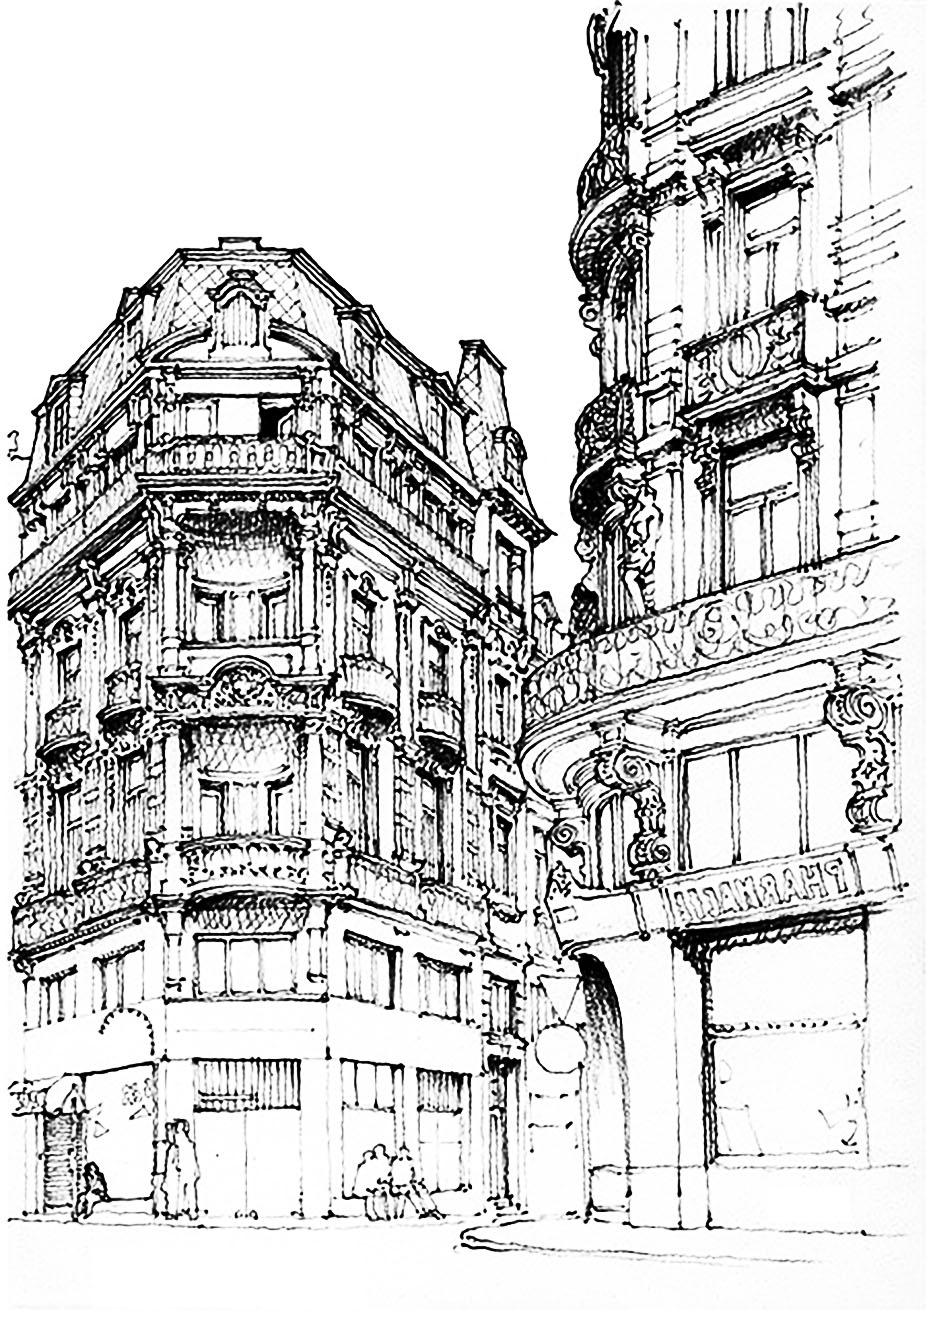 Dessin d'une rue de Paris